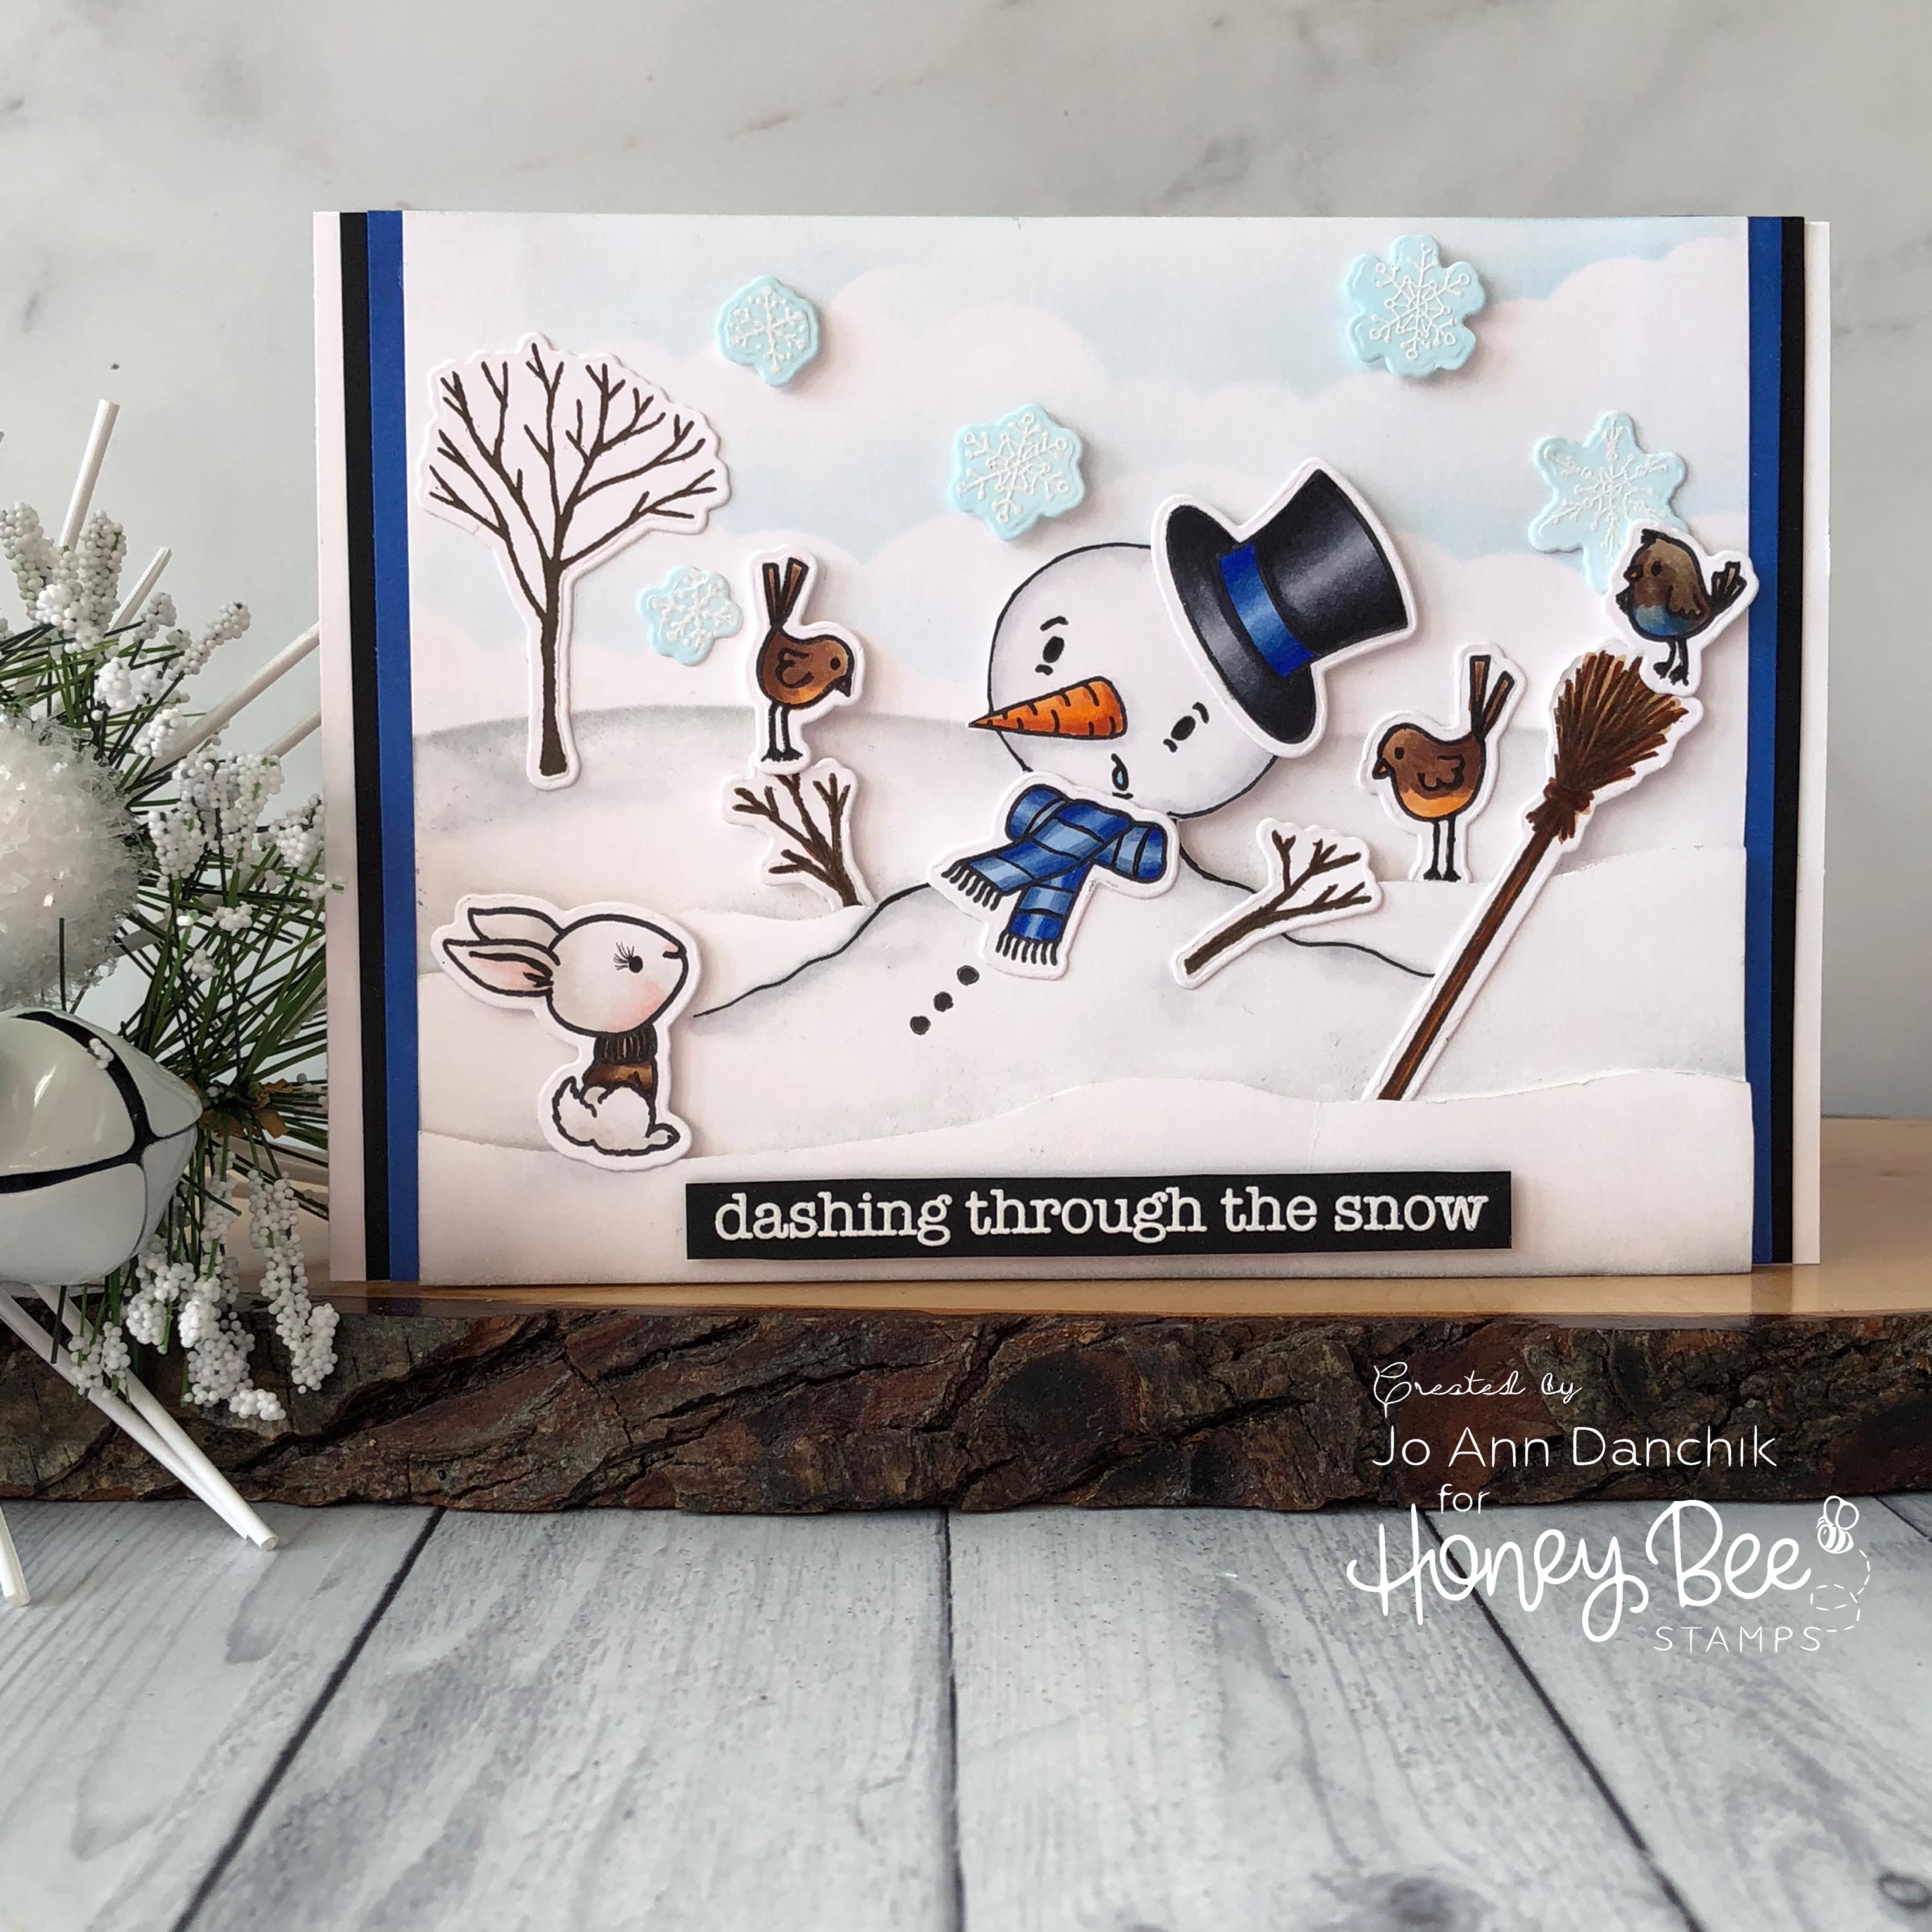 Creative Sundays With Jo Ann: Dashing Through The Snow